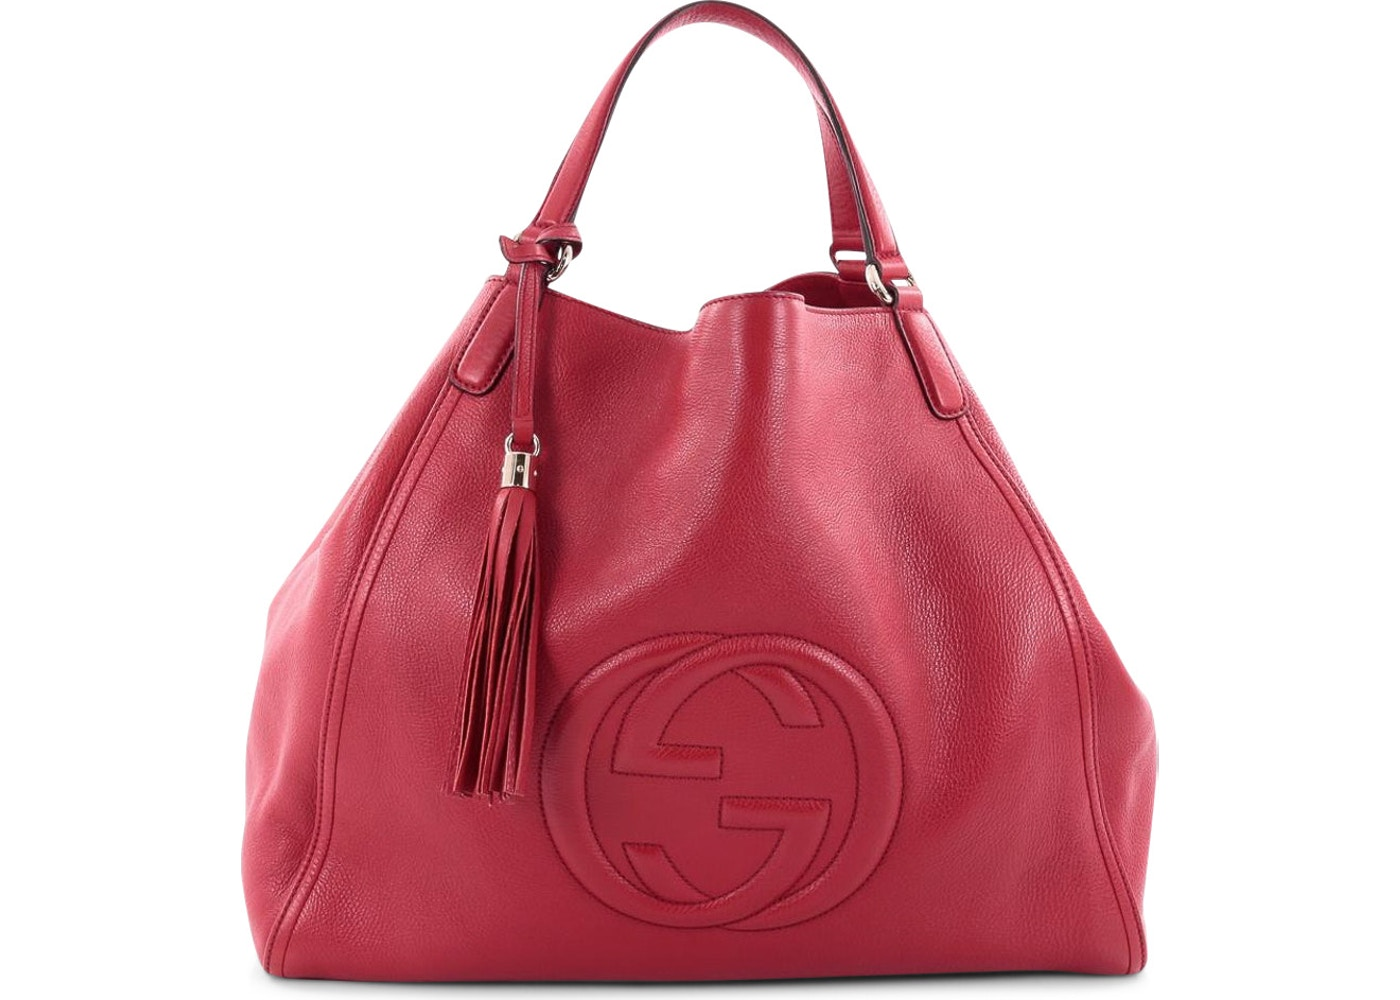 bc1878149 Gucci Soho Shoulder Bag GG Interlocking GG Logo Stitched Large Red. GG  Interlocking GG Logo Stitched Large Red